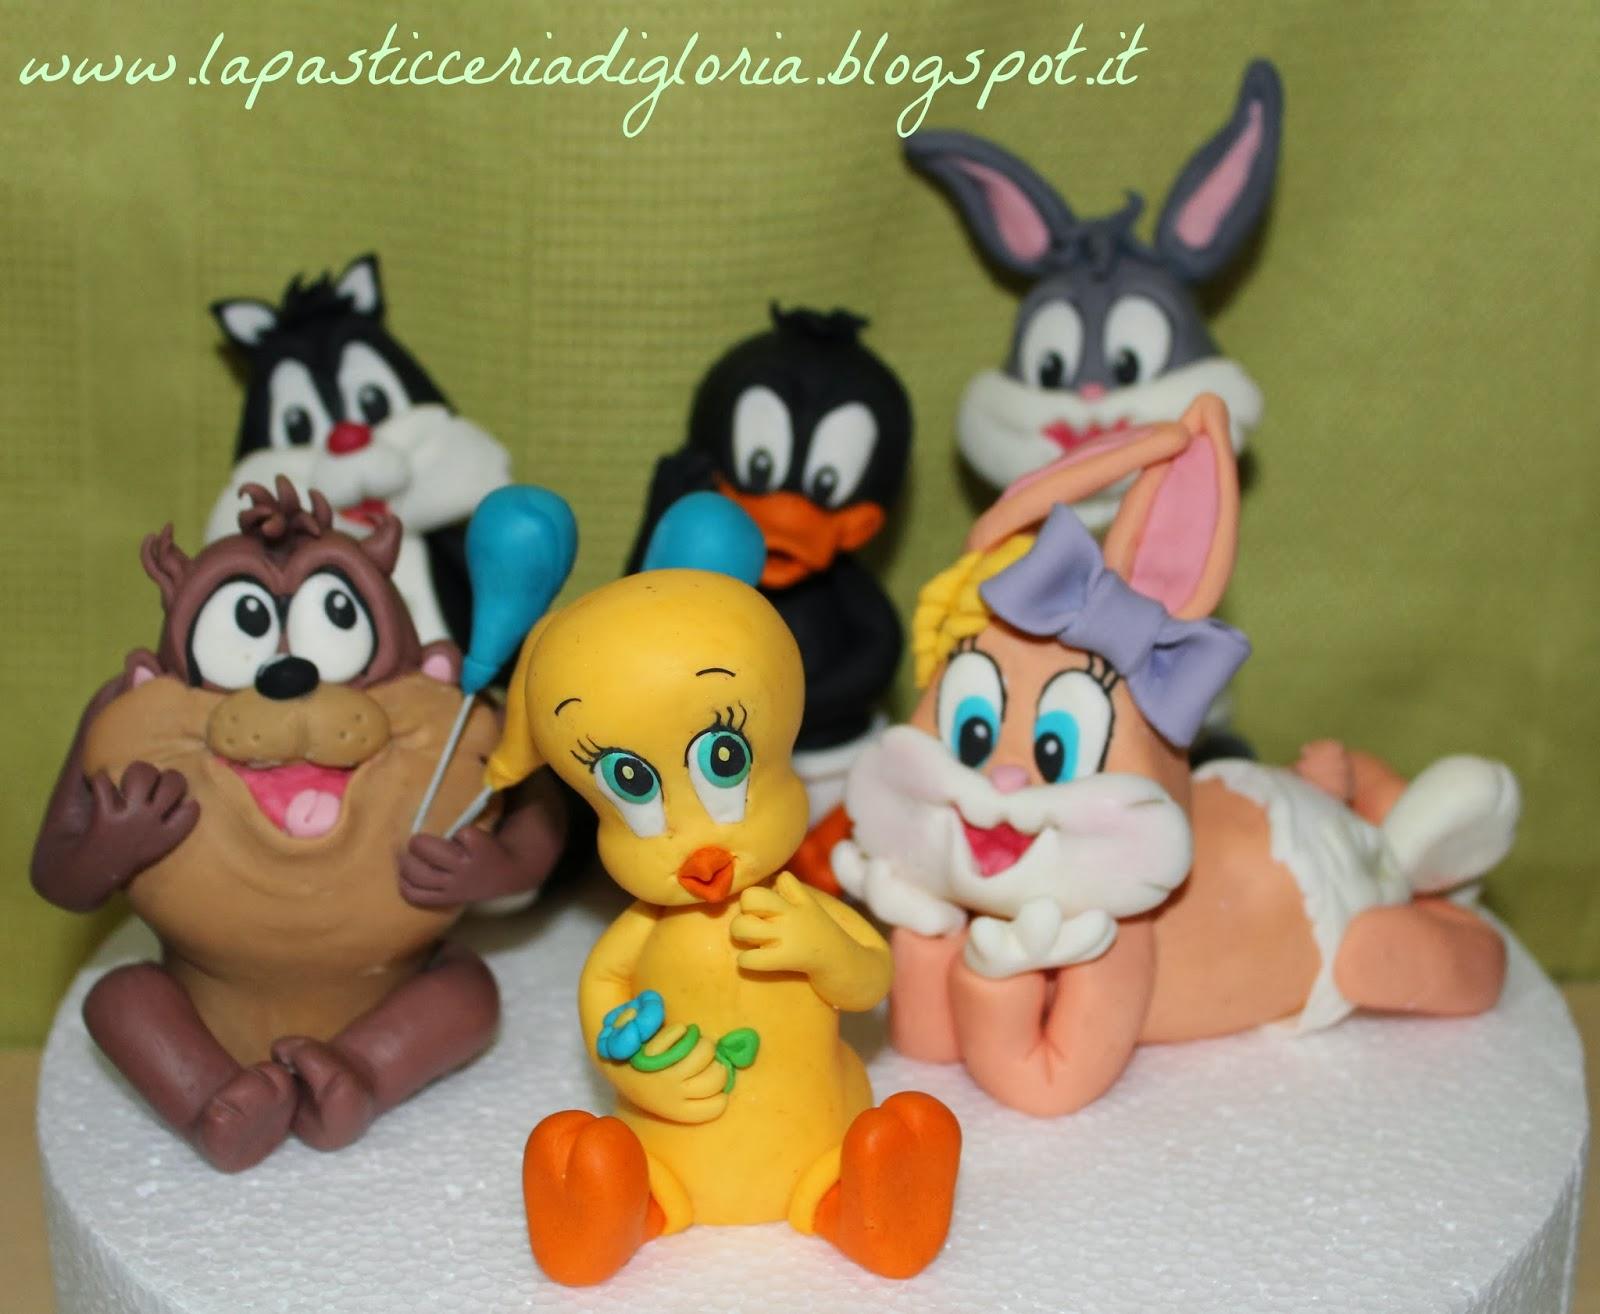 Baby looney tunes da la pasticceria di gloria su - Bebe looney tunes ...